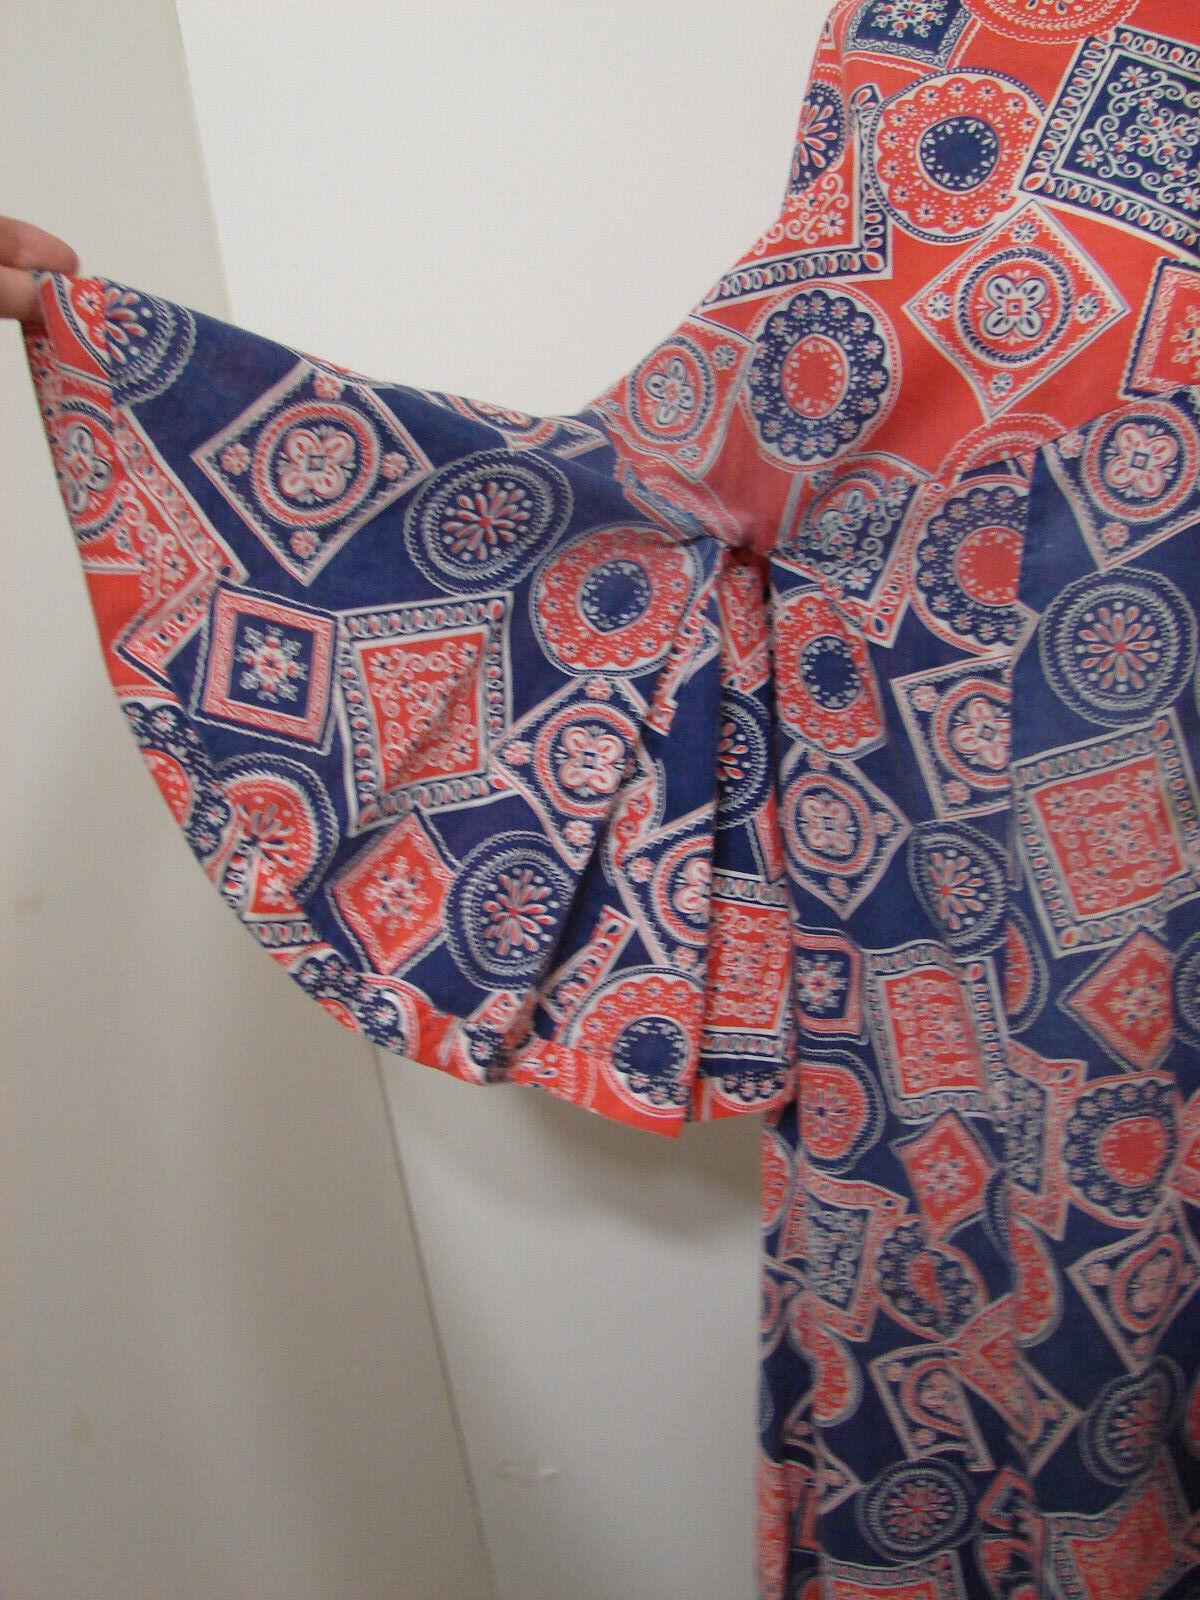 PEGGY LOU Caftan Dress Vintage 1960's Groovy Patc… - image 3